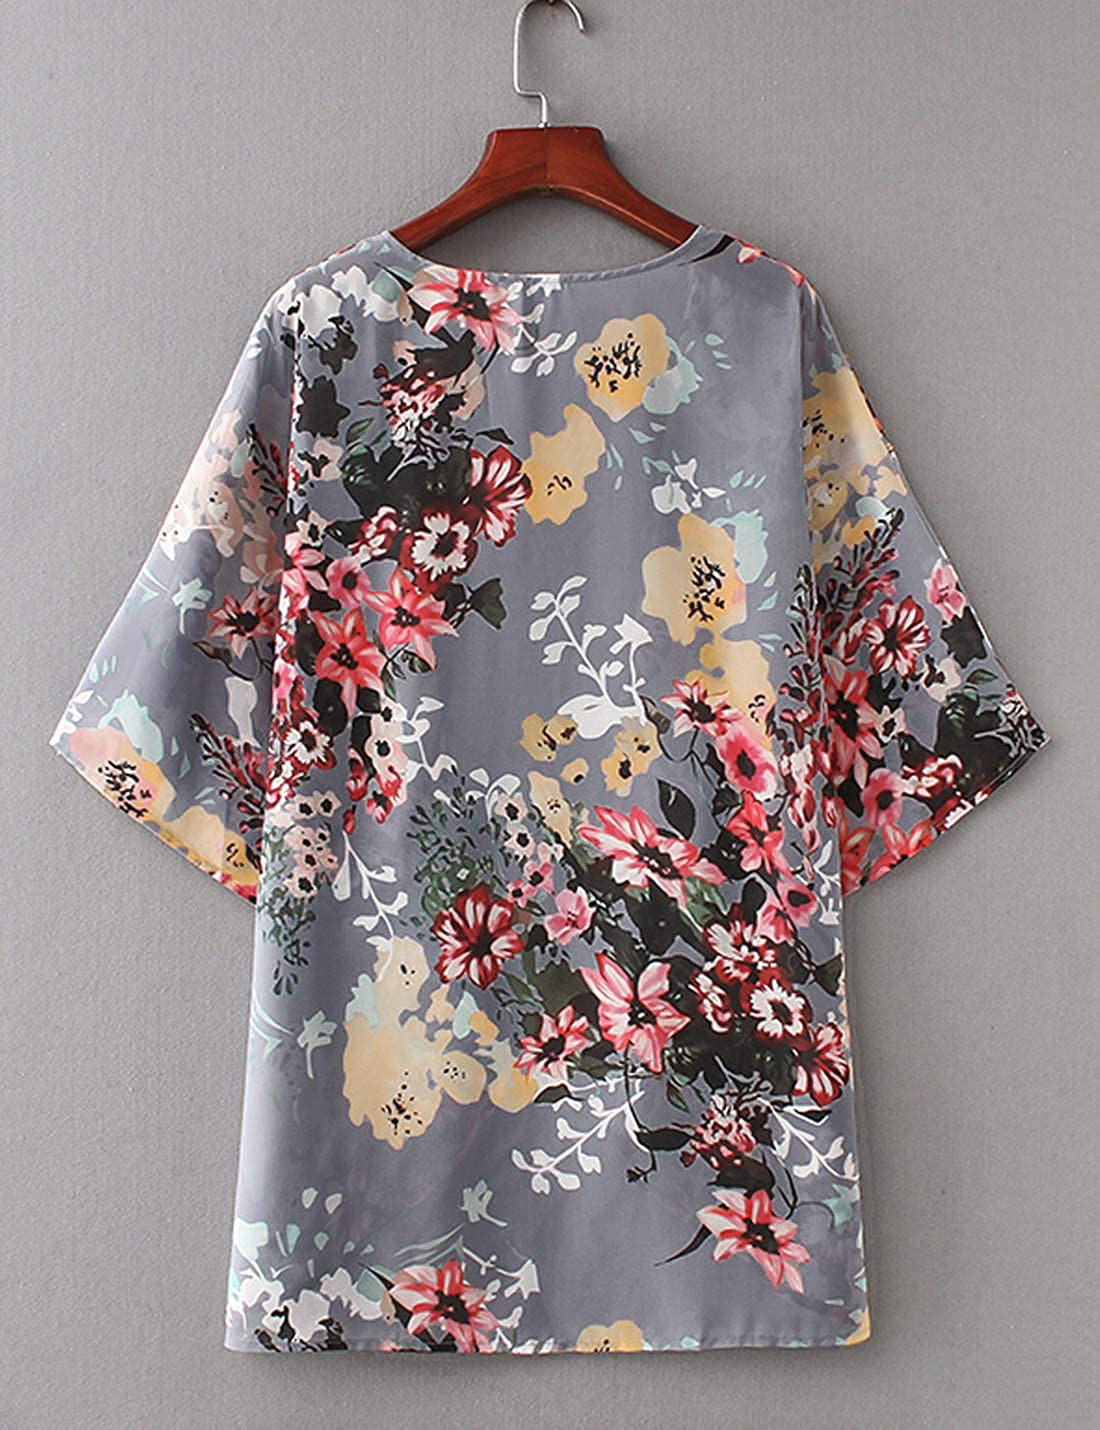 Omoone Womens Batwing Sleeve Floral Chiffon Cardigan Kimono Beachwear Cover Up